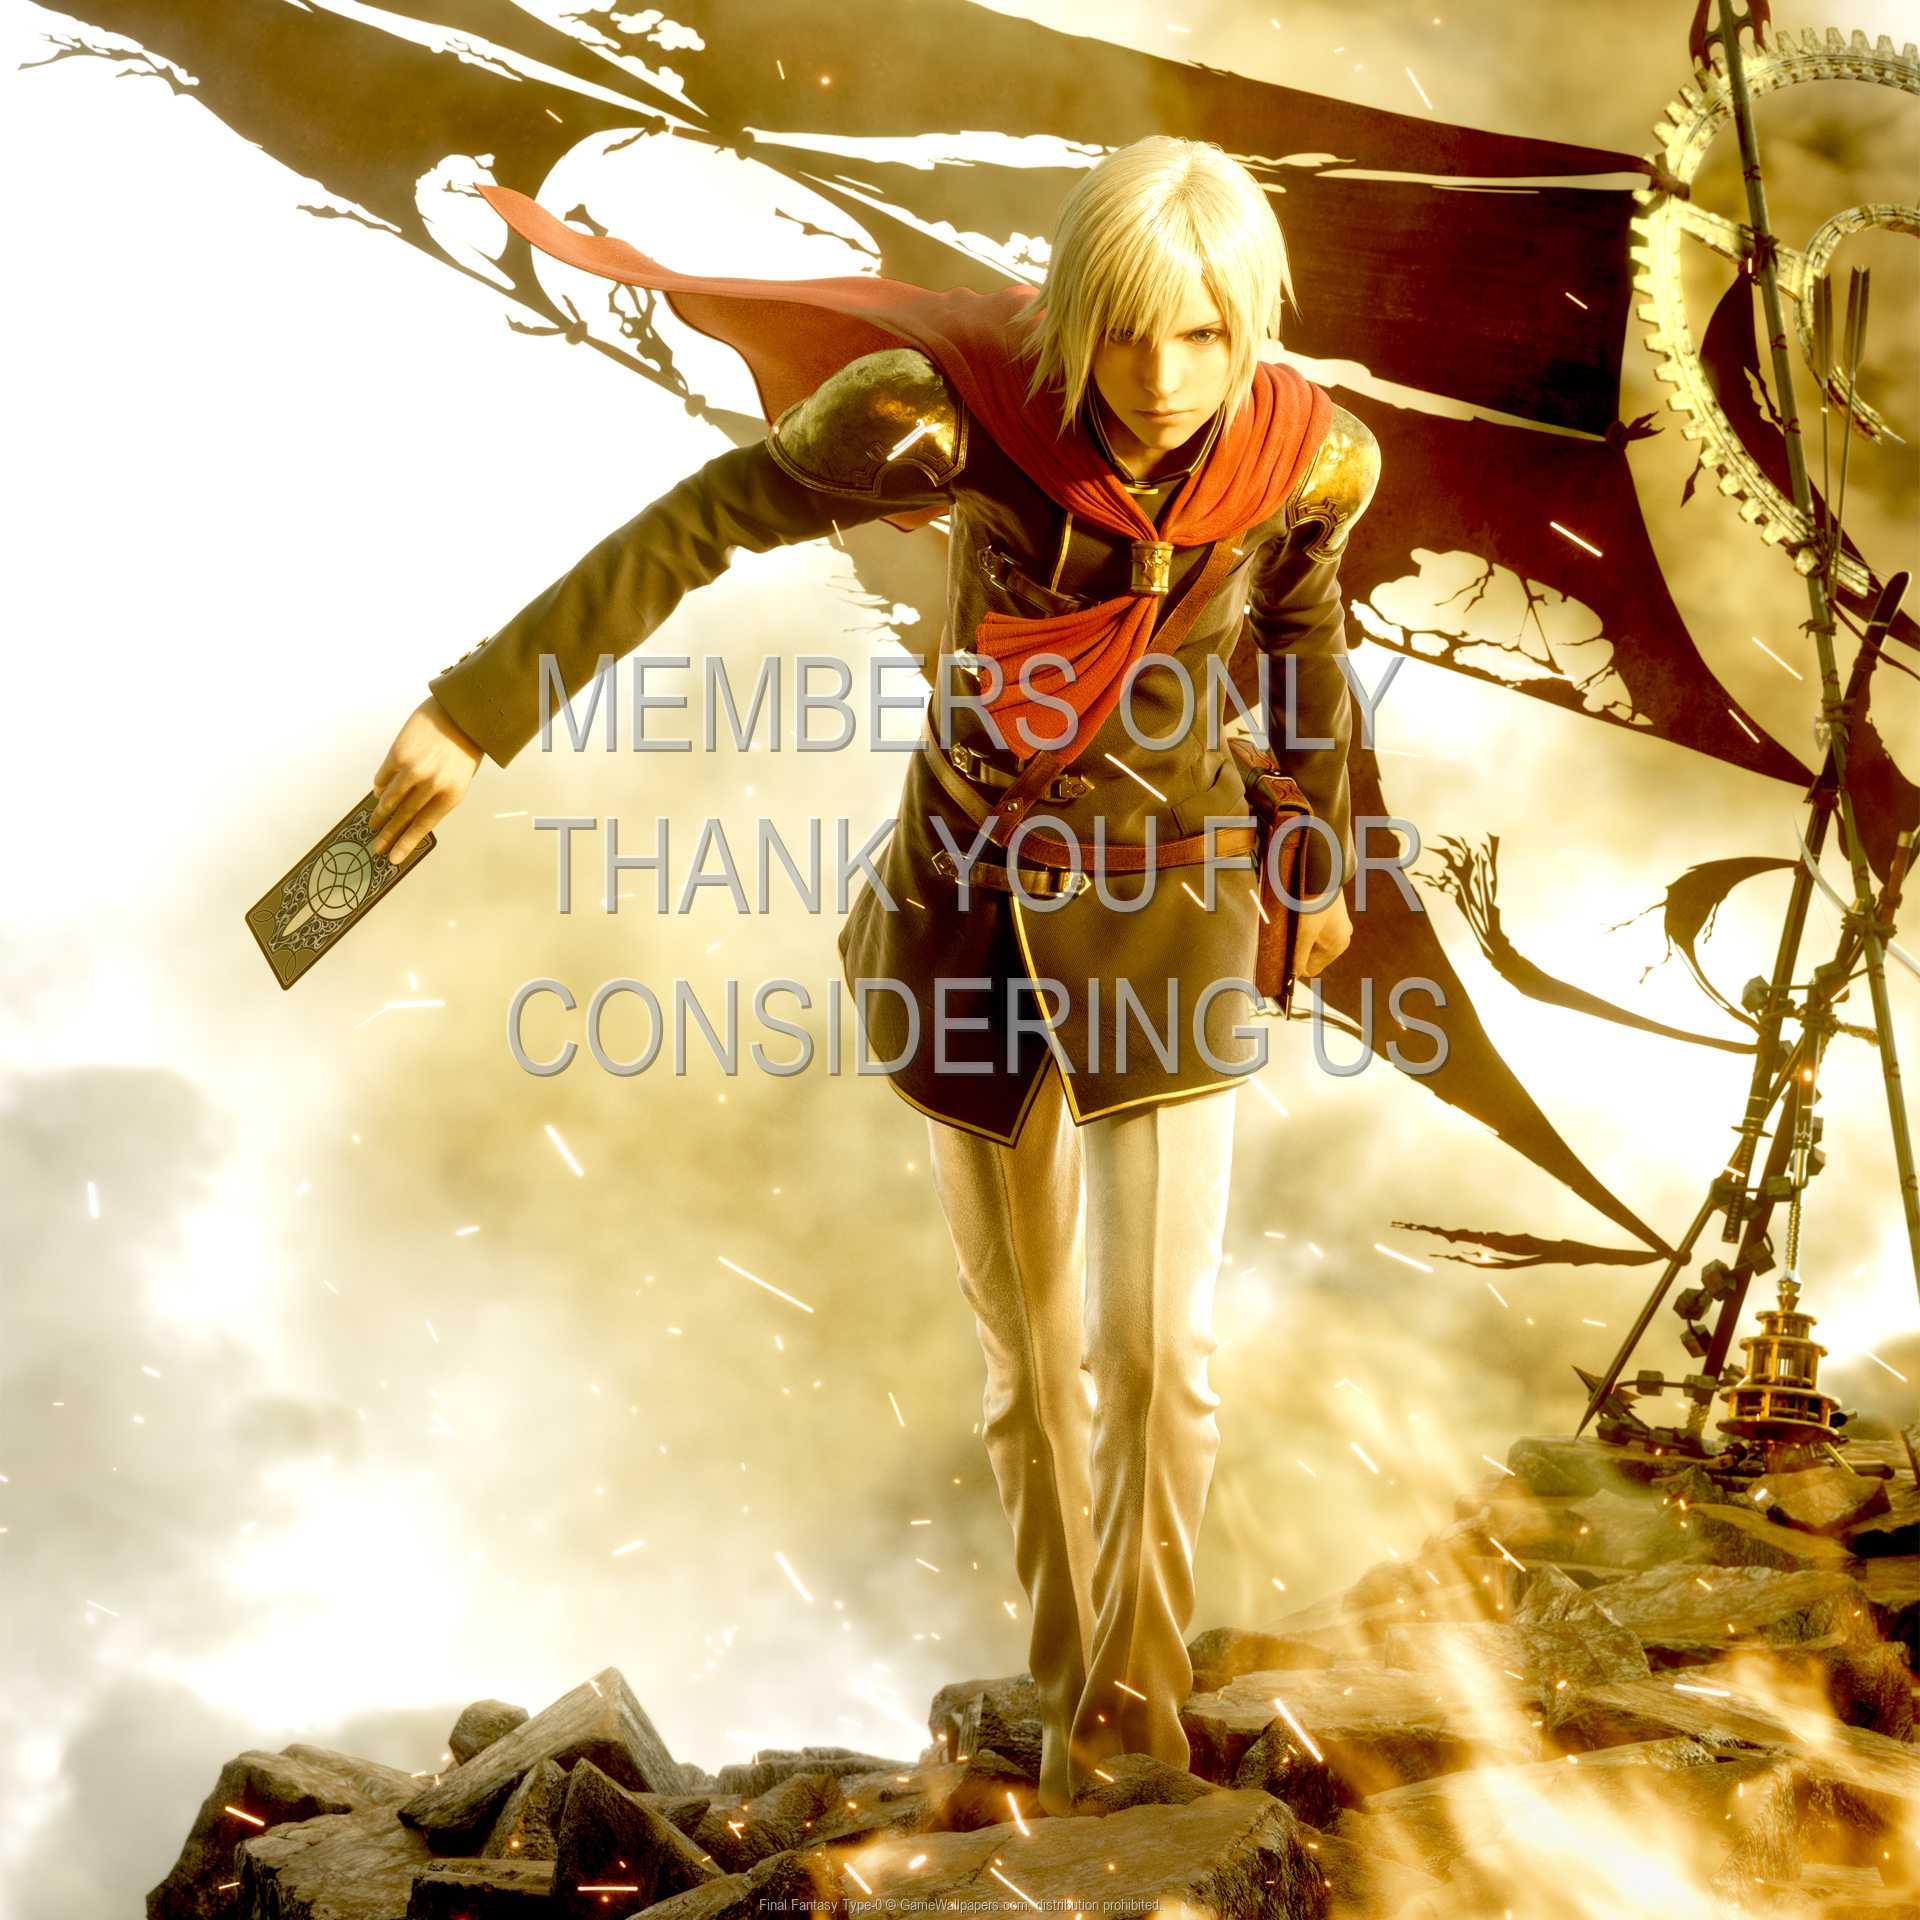 Final Fantasy Type-0 1080p Horizontal Mobile wallpaper or background 01